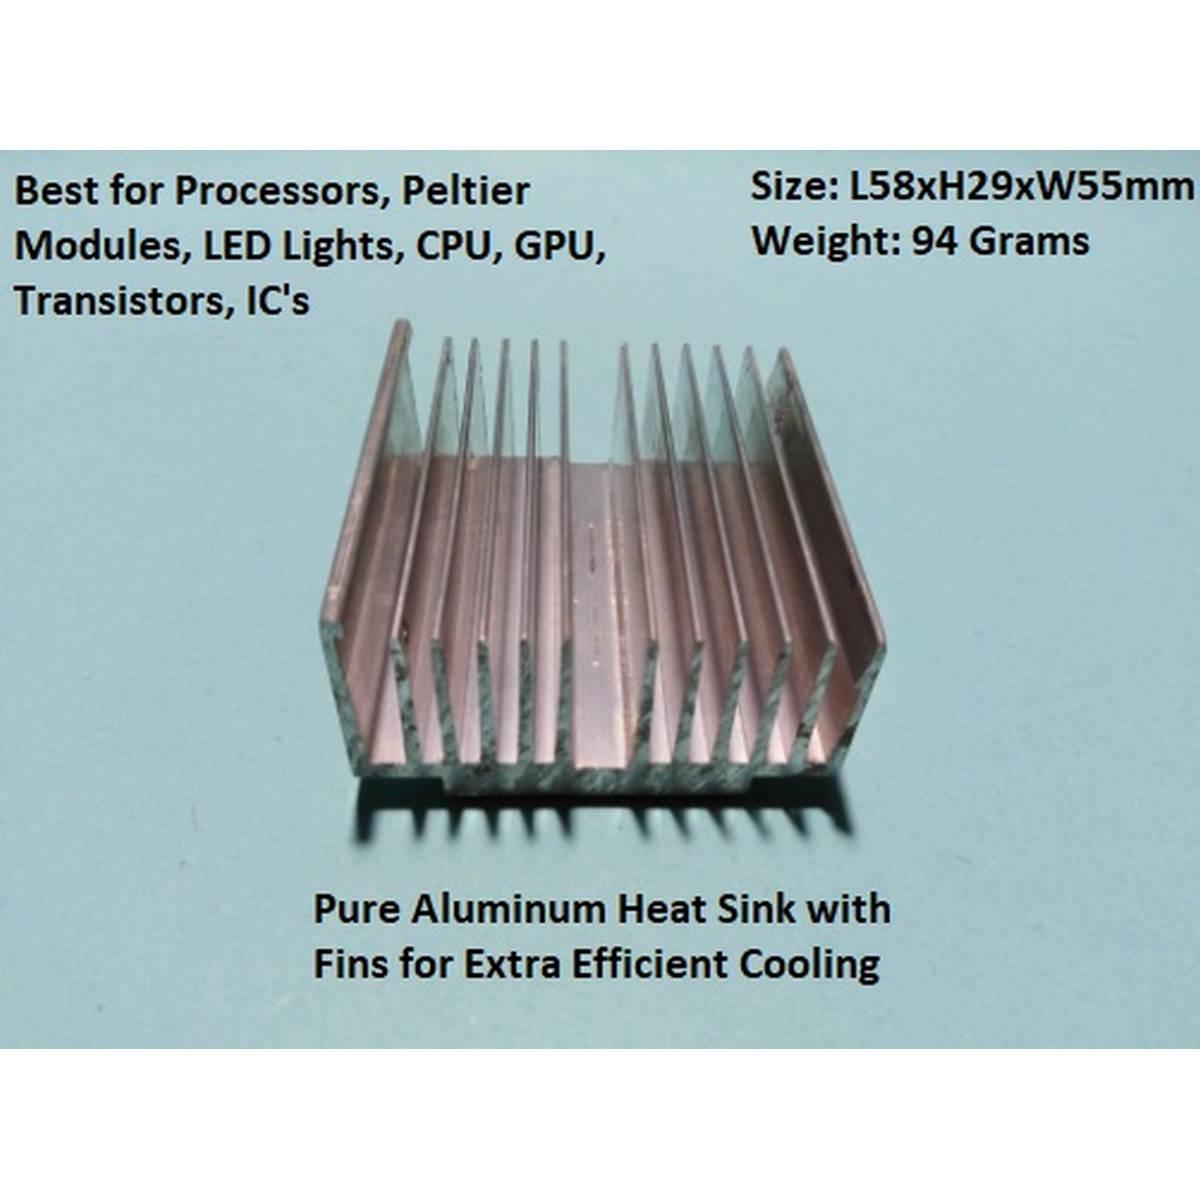 High Quality Pure Aluminum Heat Sink Cooler Cooling fin - Heatsink for Peltier, IC, LED's Transistor, RAM - Size: L58mm x H29mm x W55mm